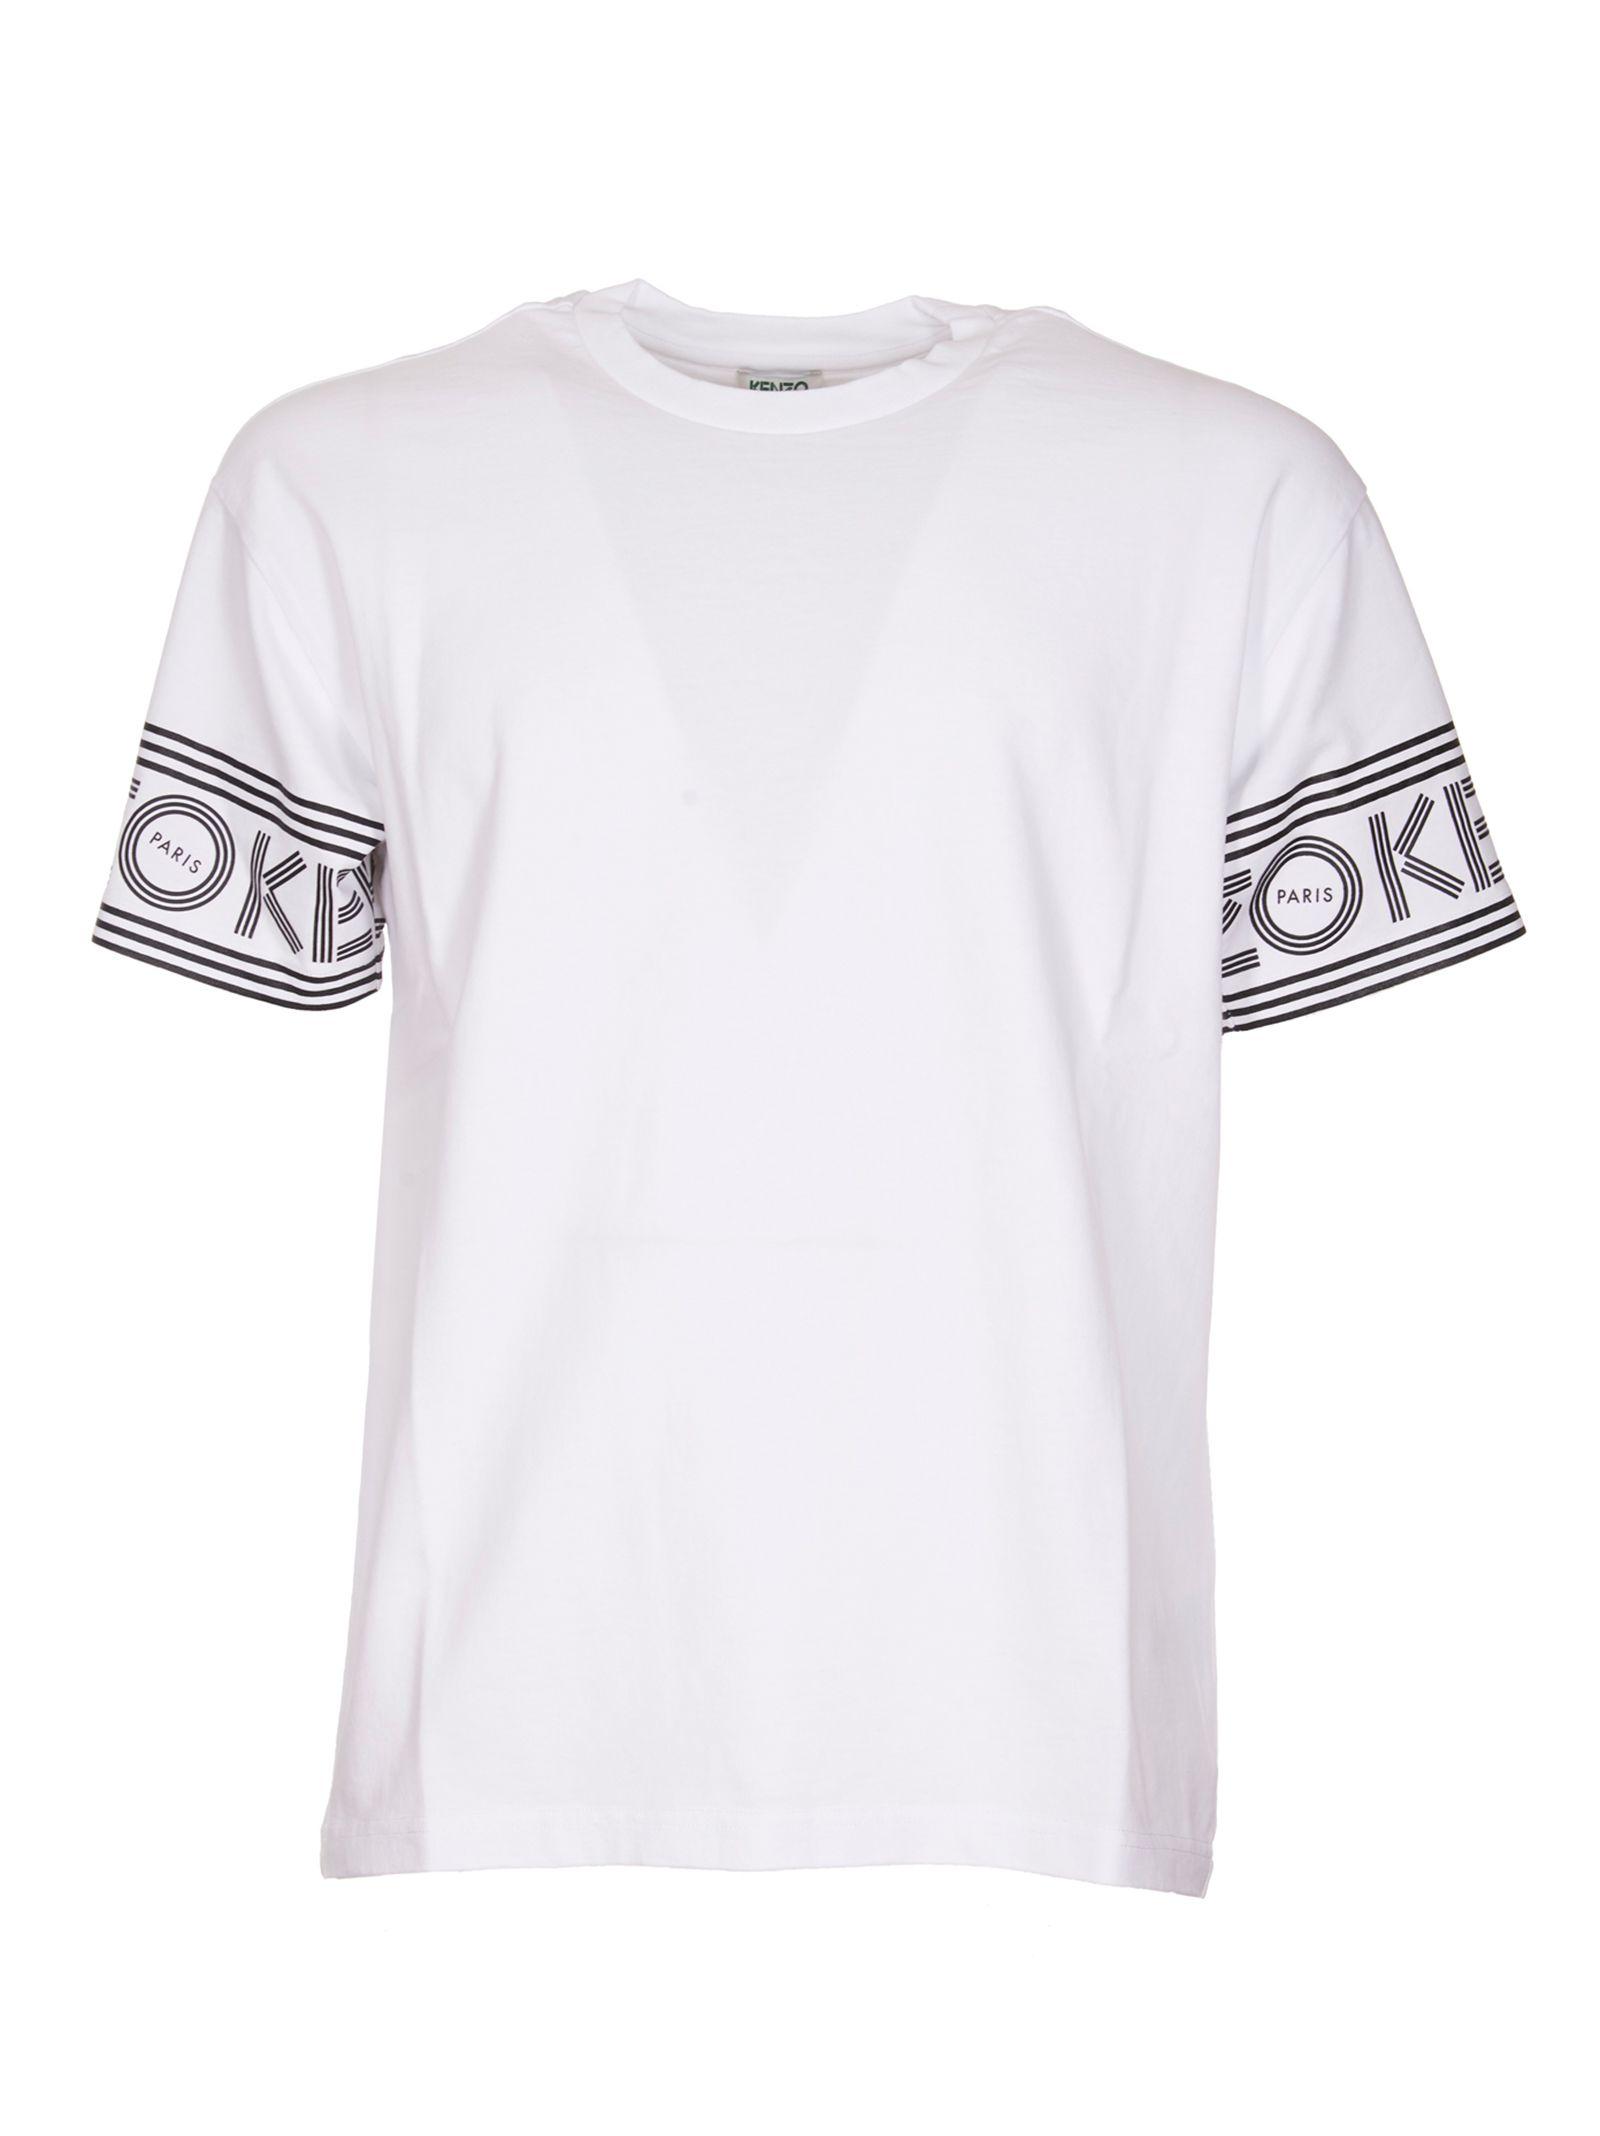 Kenzo Logo In Sleeve T-shirt